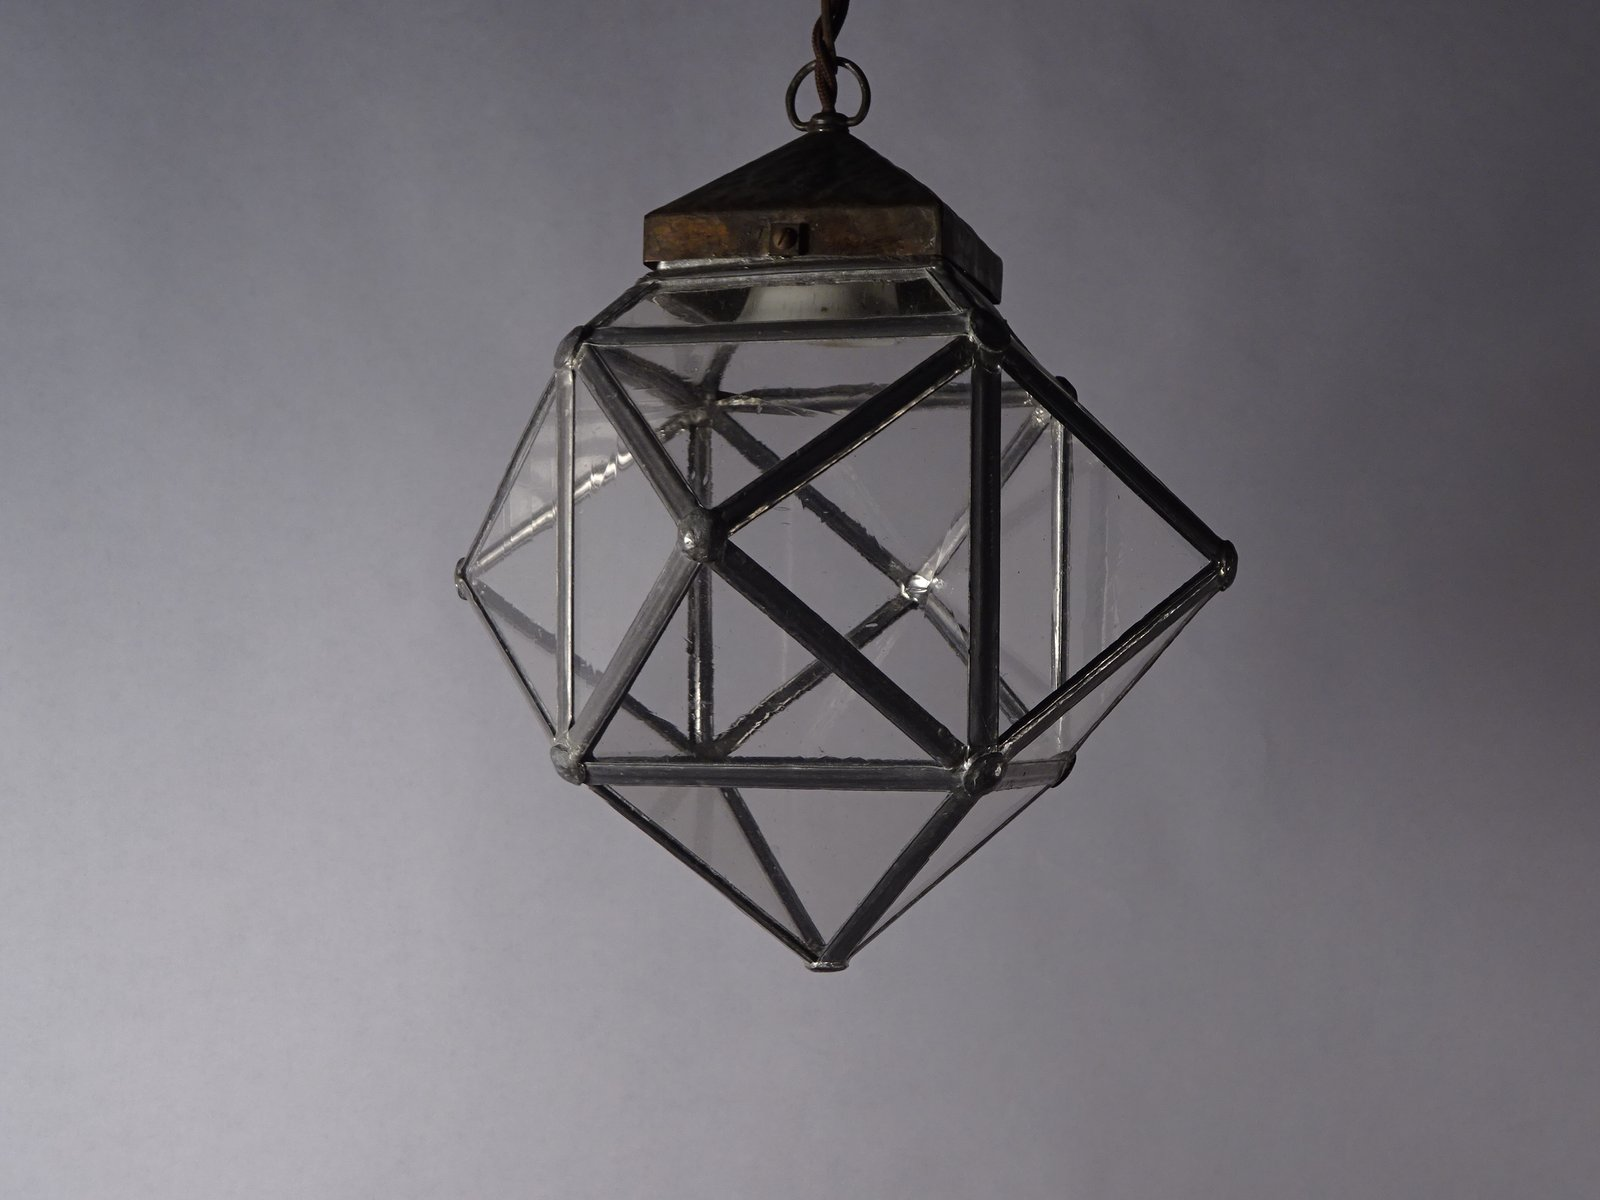 antike jugendstil deckenlampe aus messing bei pamono kaufen. Black Bedroom Furniture Sets. Home Design Ideas